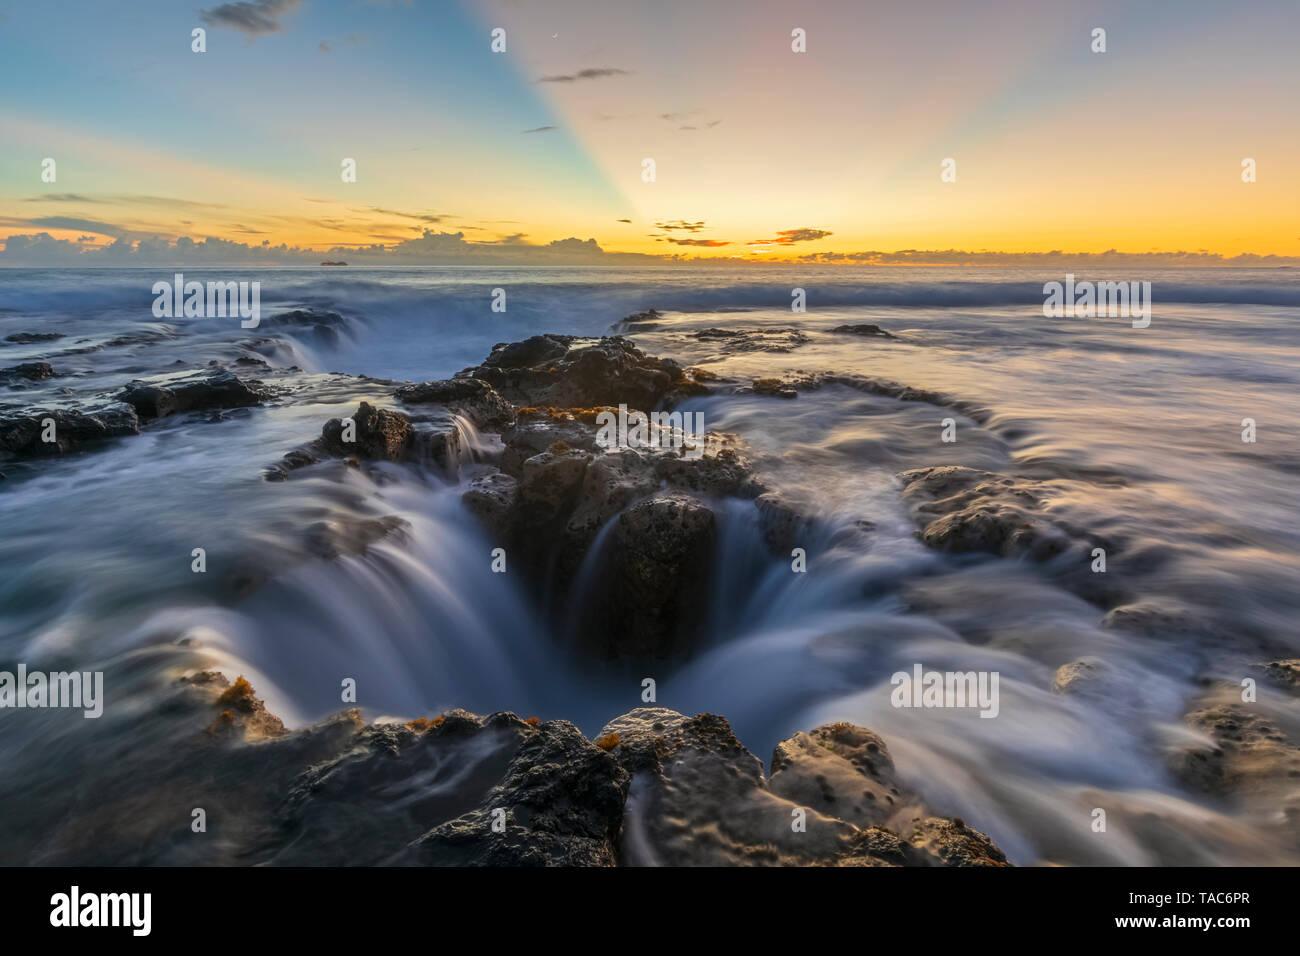 USA, Hawaii, große Insel, Kona, Pele's Gut, Blowhole an aunset Stockfoto